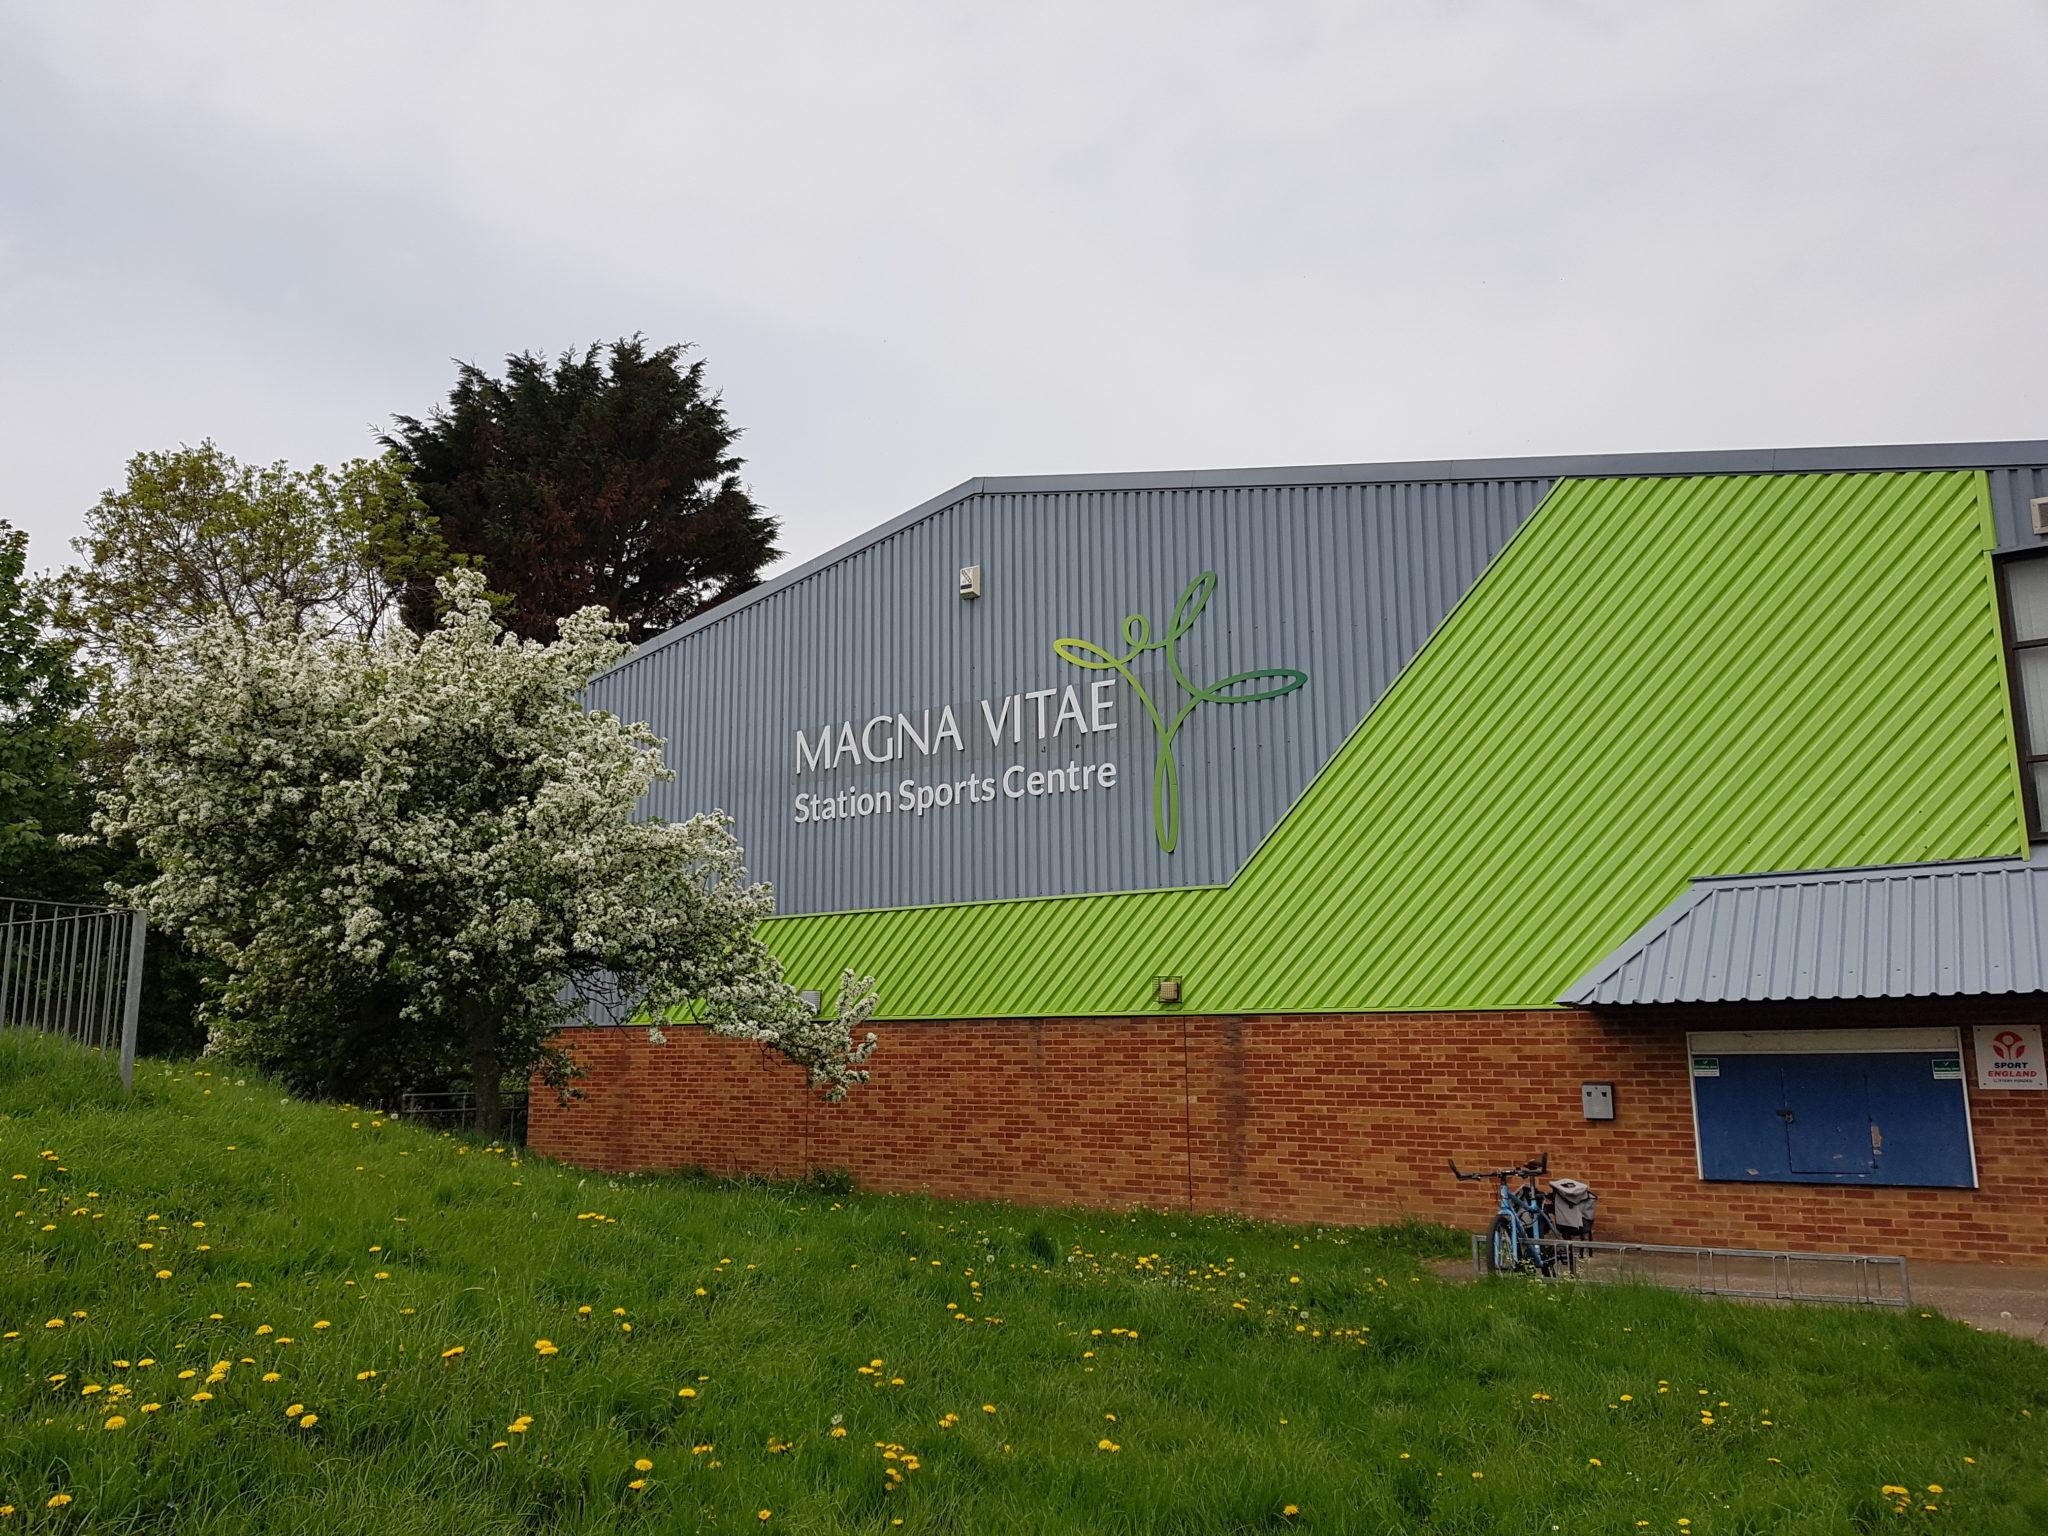 Station Sports Centre, Mablethorpe, Lincolnshire, Magna Vitae